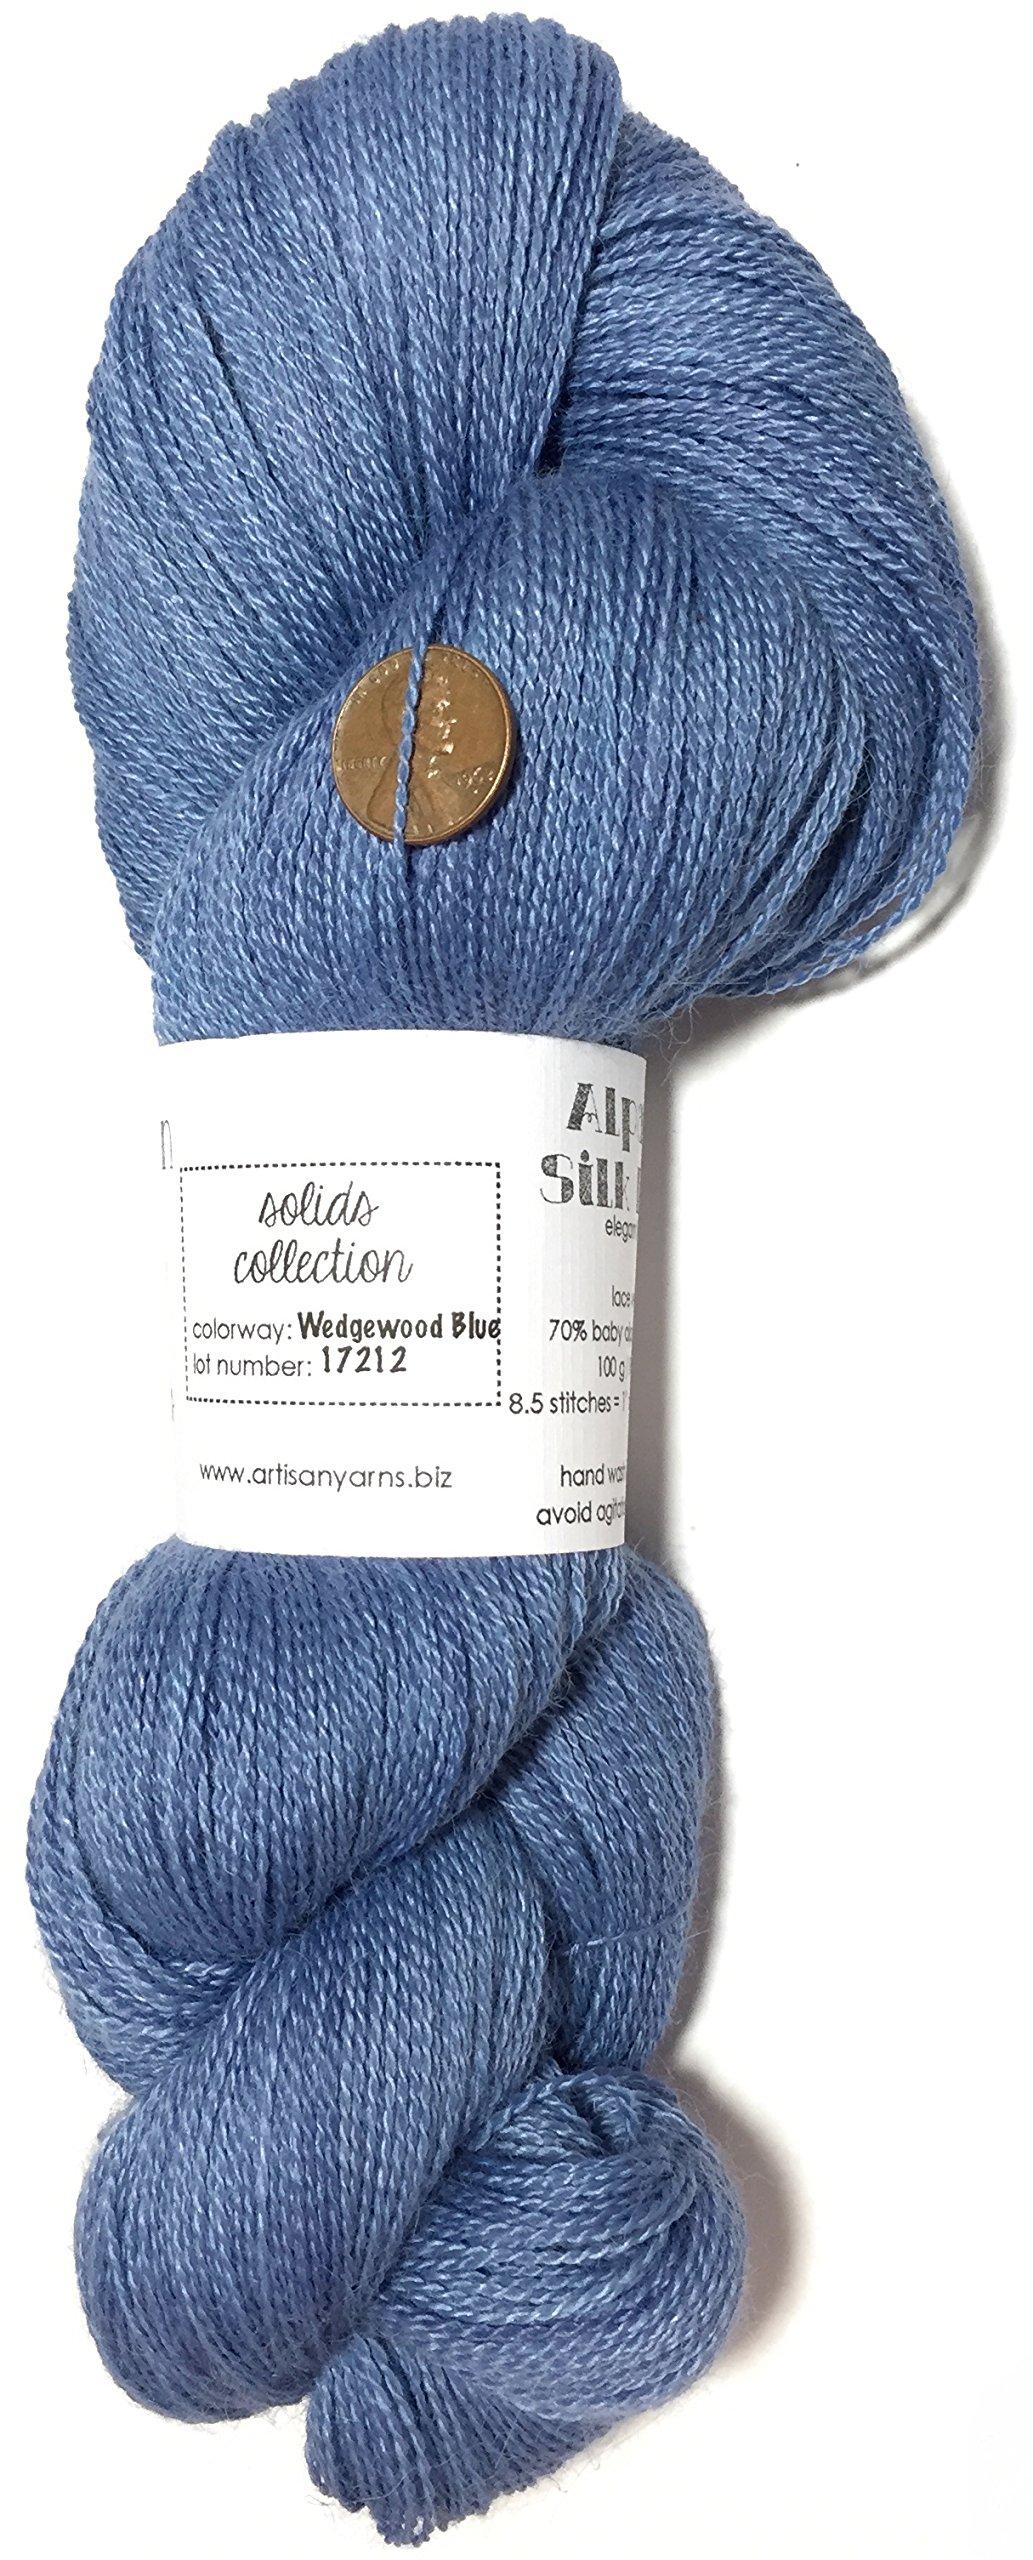 Hand Dyed Alpaca Silk Yarn, Solid Wedgewood Blue, Lace Weight, 100 Grams, 875 Yards, 70/30 Baby Alpaca/Mulberry Silk